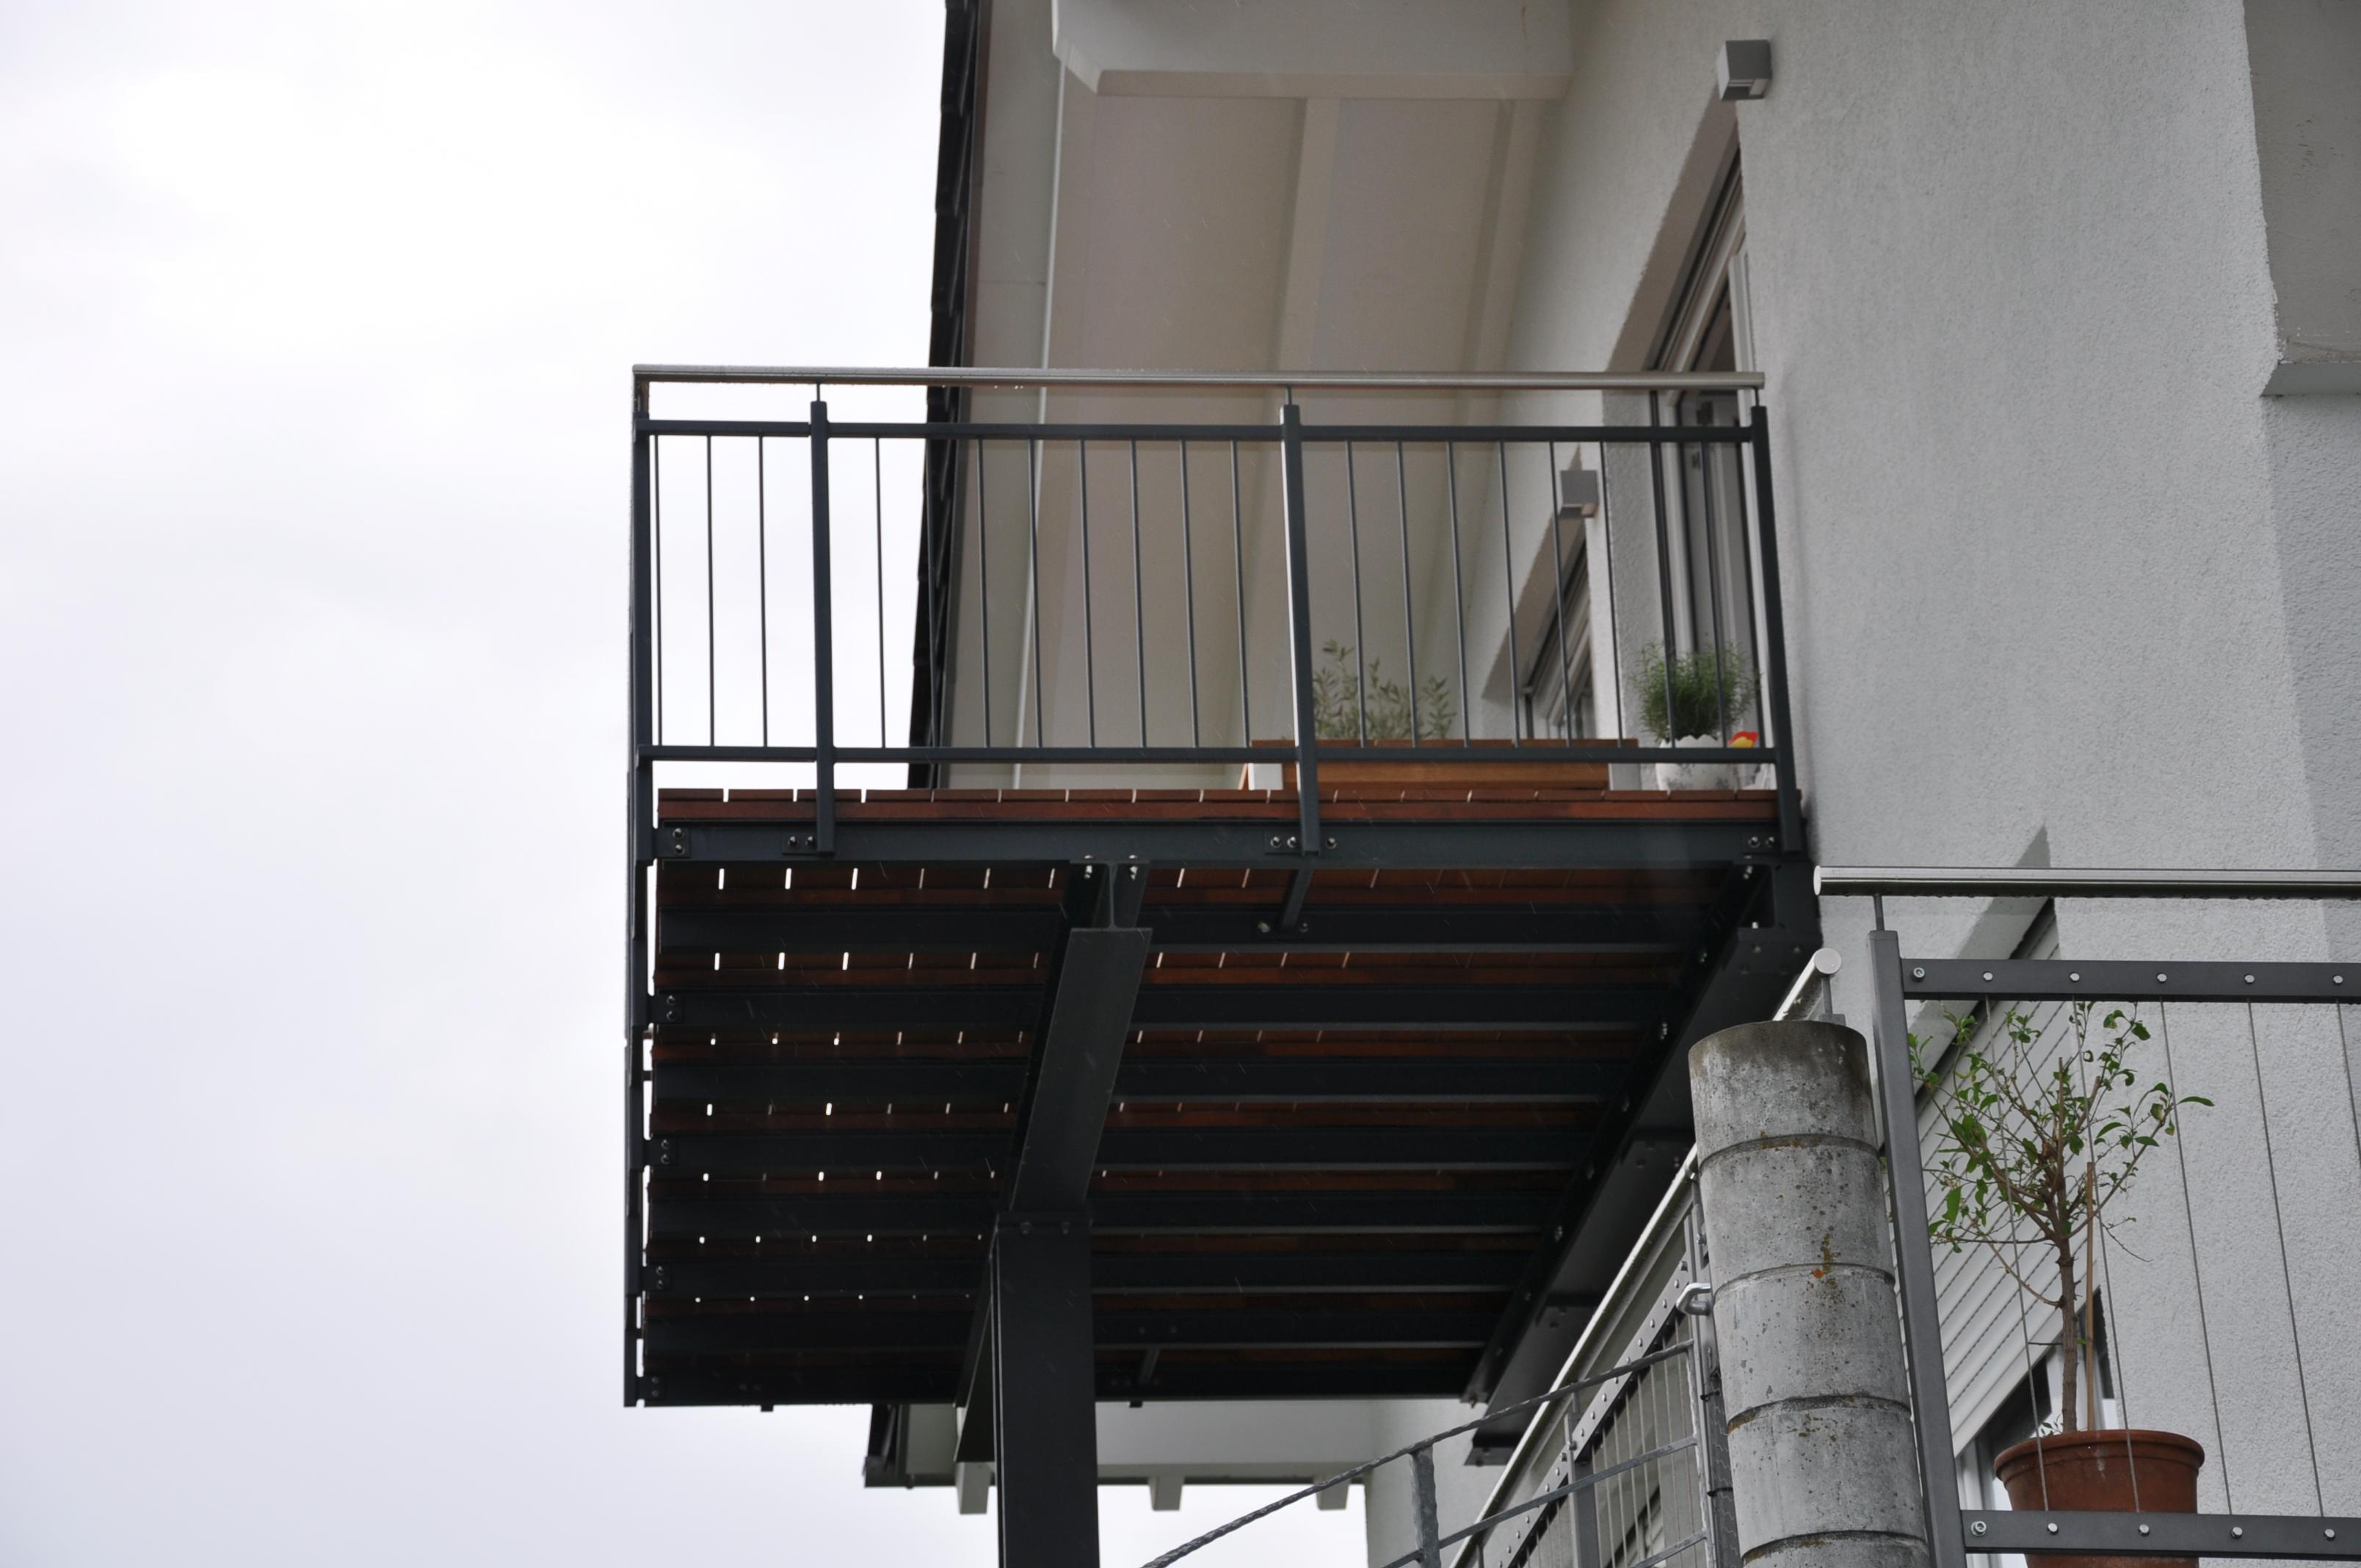 balkonanbau pl derhausen stahlbau n gele. Black Bedroom Furniture Sets. Home Design Ideas